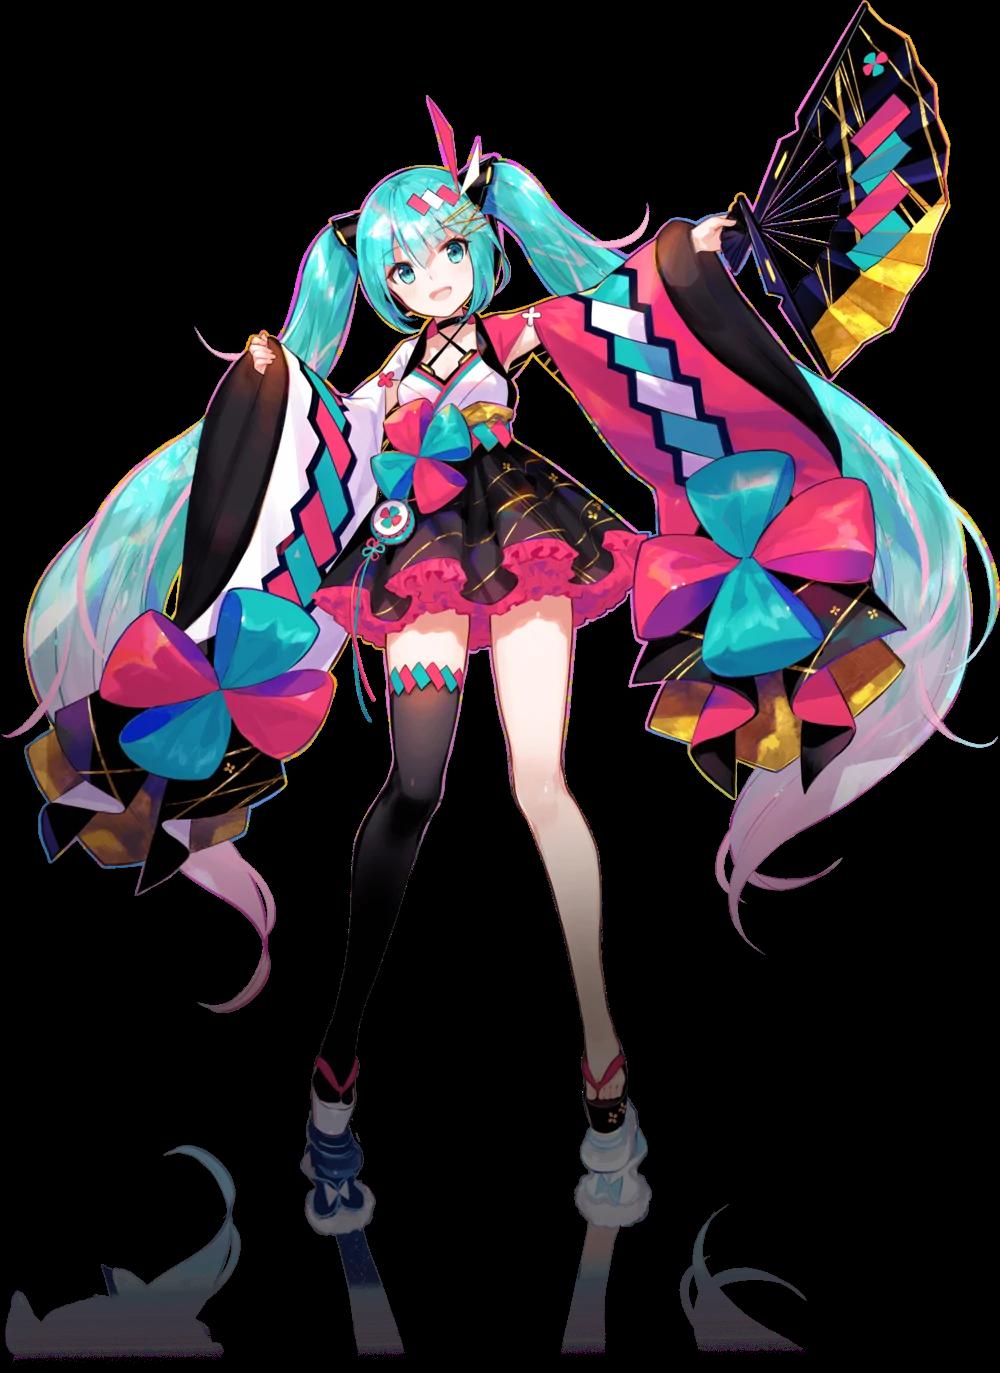 Hatsune Miku Magical Mirai 2020 Vocaloid Wiki Fandom Hatsune Miku Outfits Hatsune Hatsune Miku